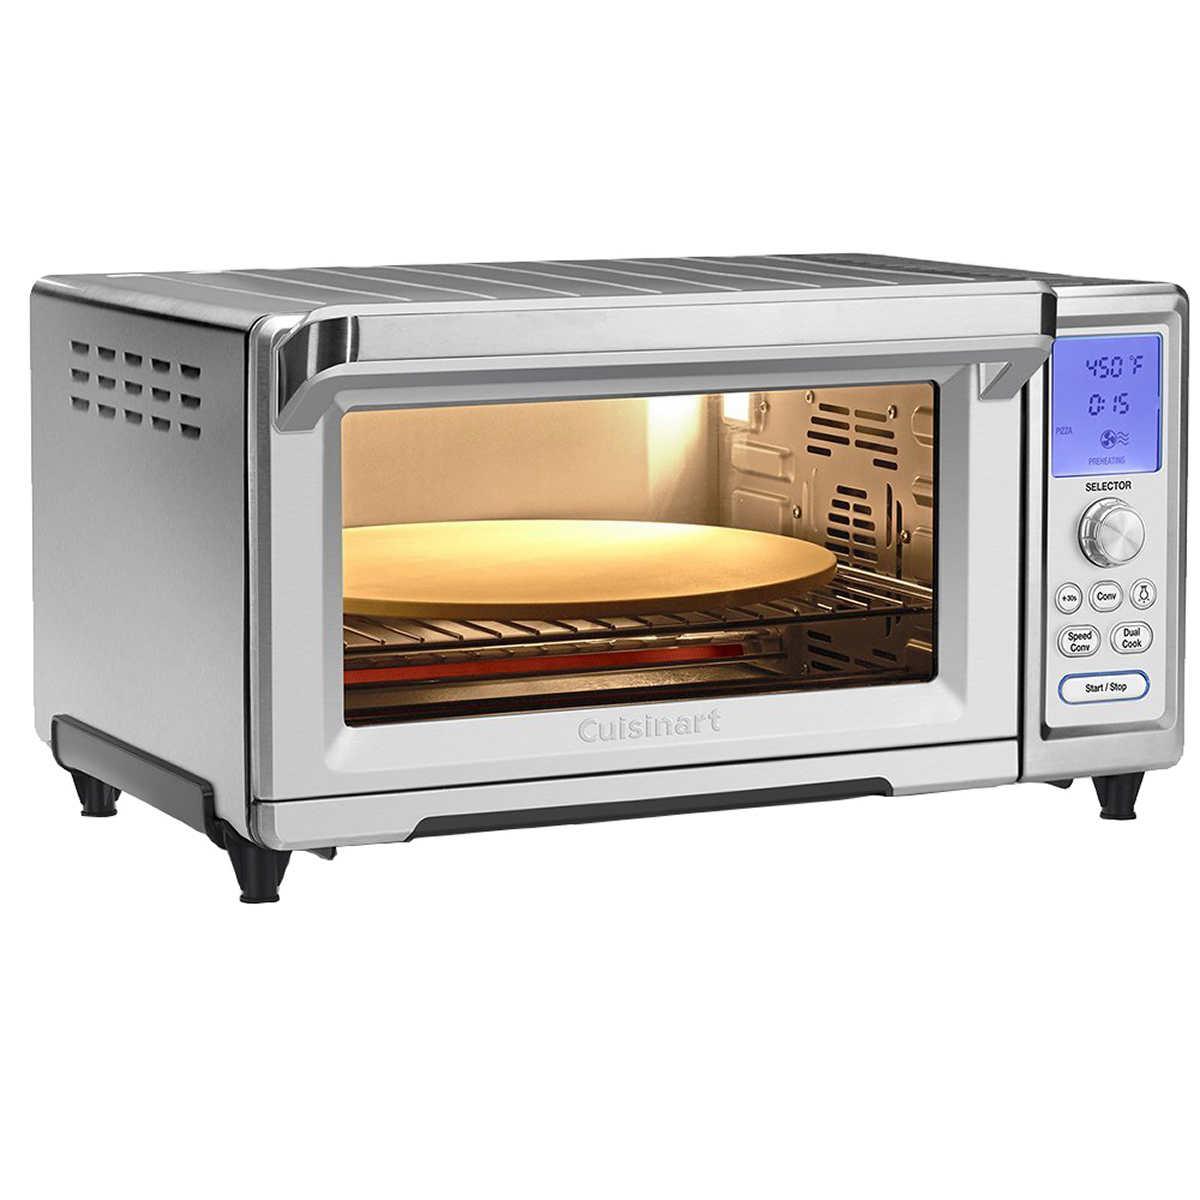 Kitchenaid Microwave Steamer Used Blender Ebay Kitchenaid